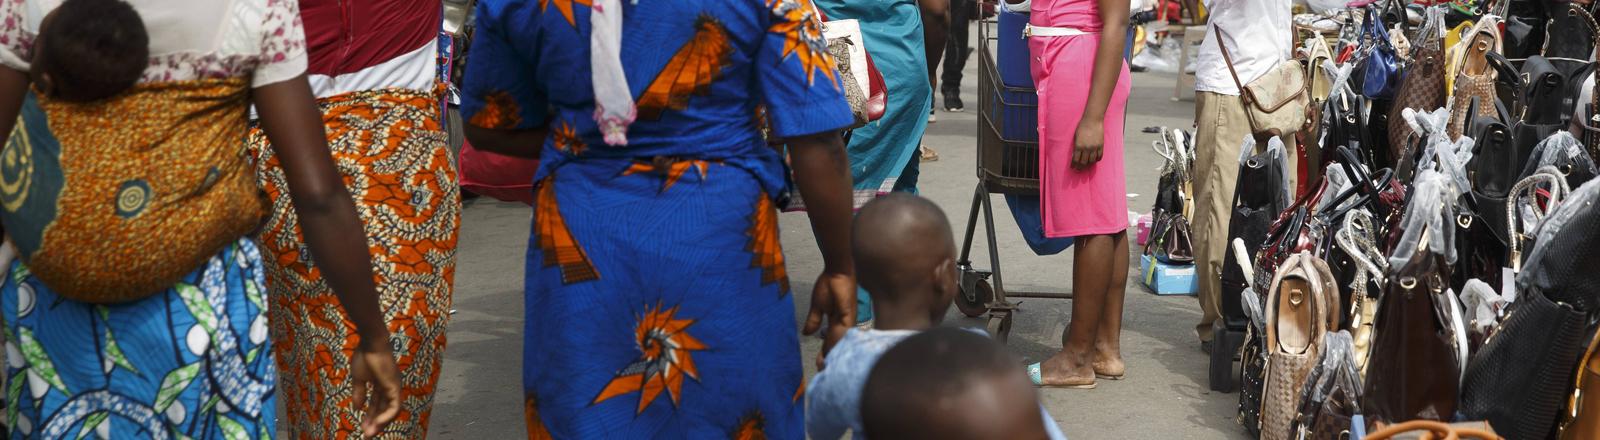 Straßenszene in Cotonou, Benin